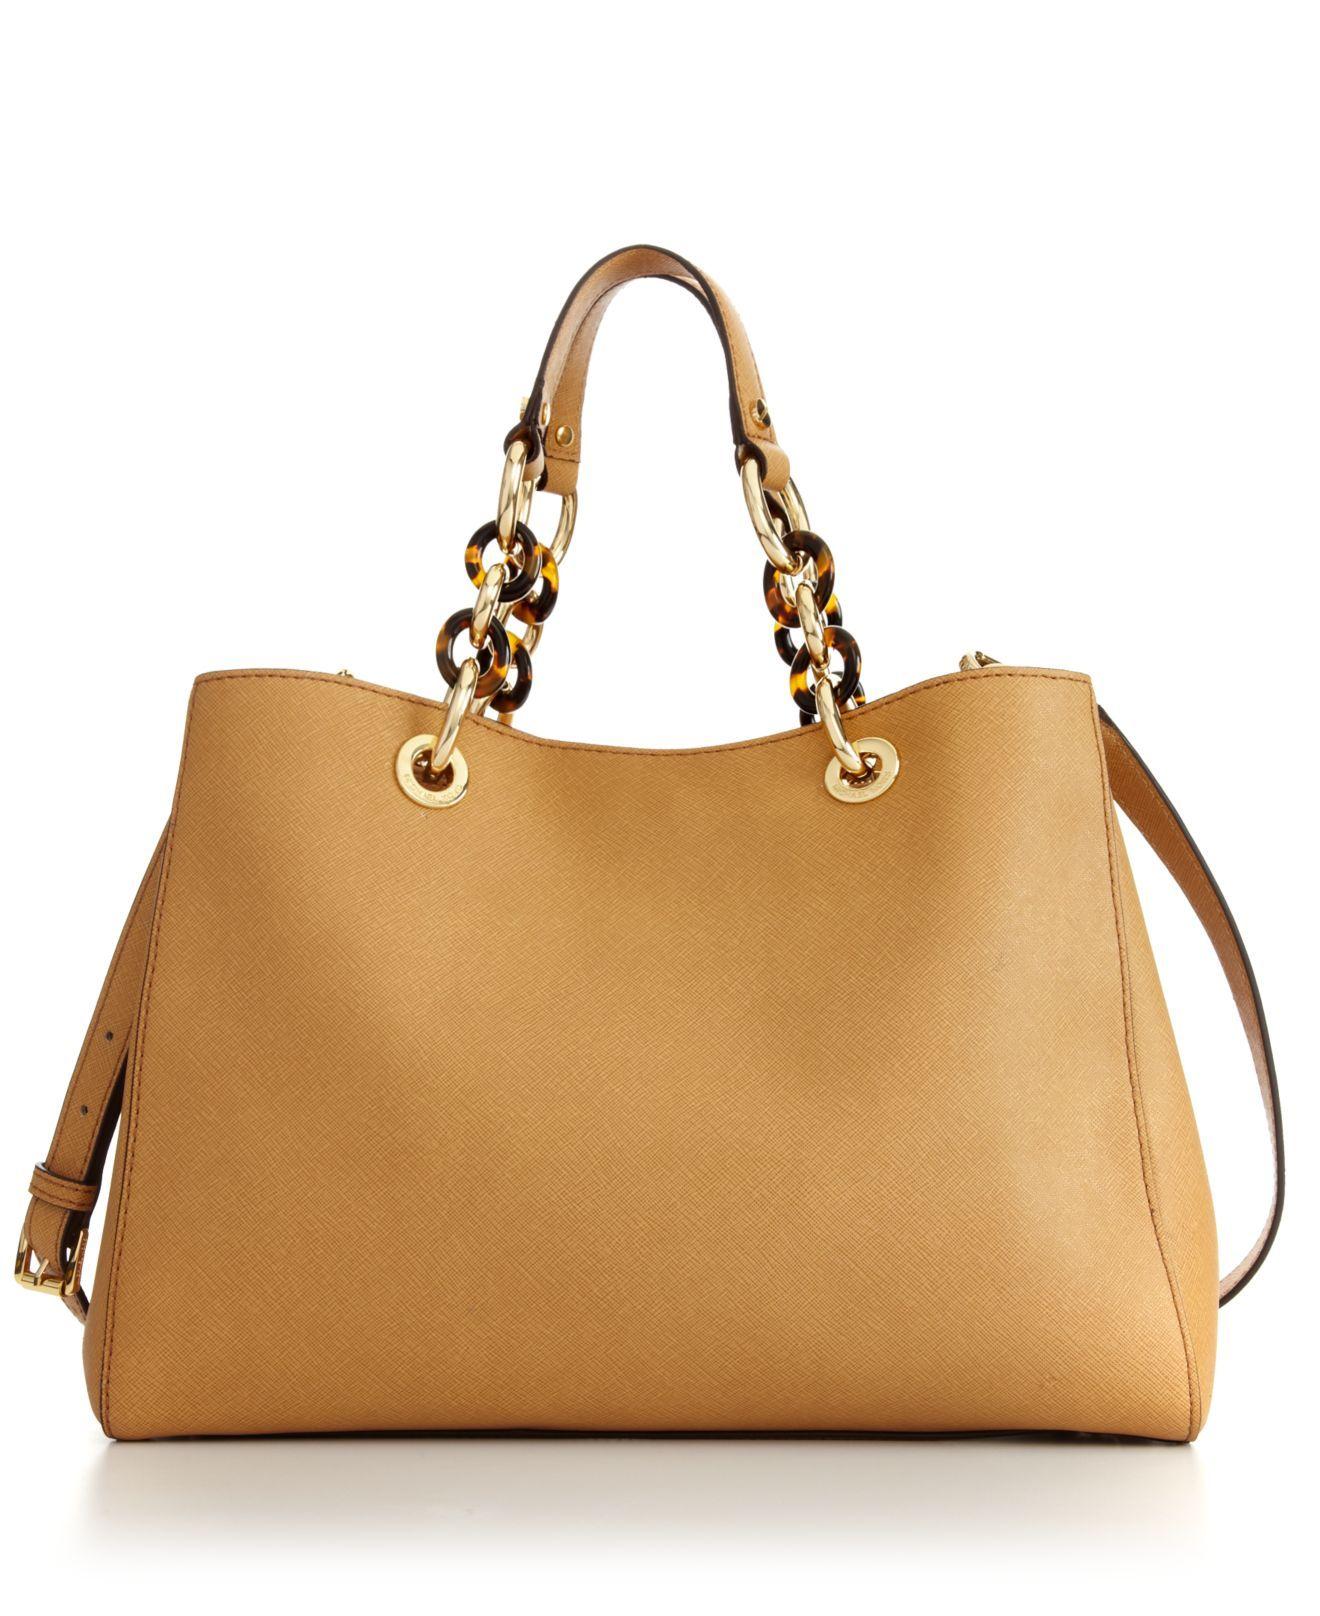 412928a2983a MICHAEL Michael Kors Handbag, Cynthia Medium Satchel - MICHAEL Michael Kors  - Handbags & Accessories - Macy's